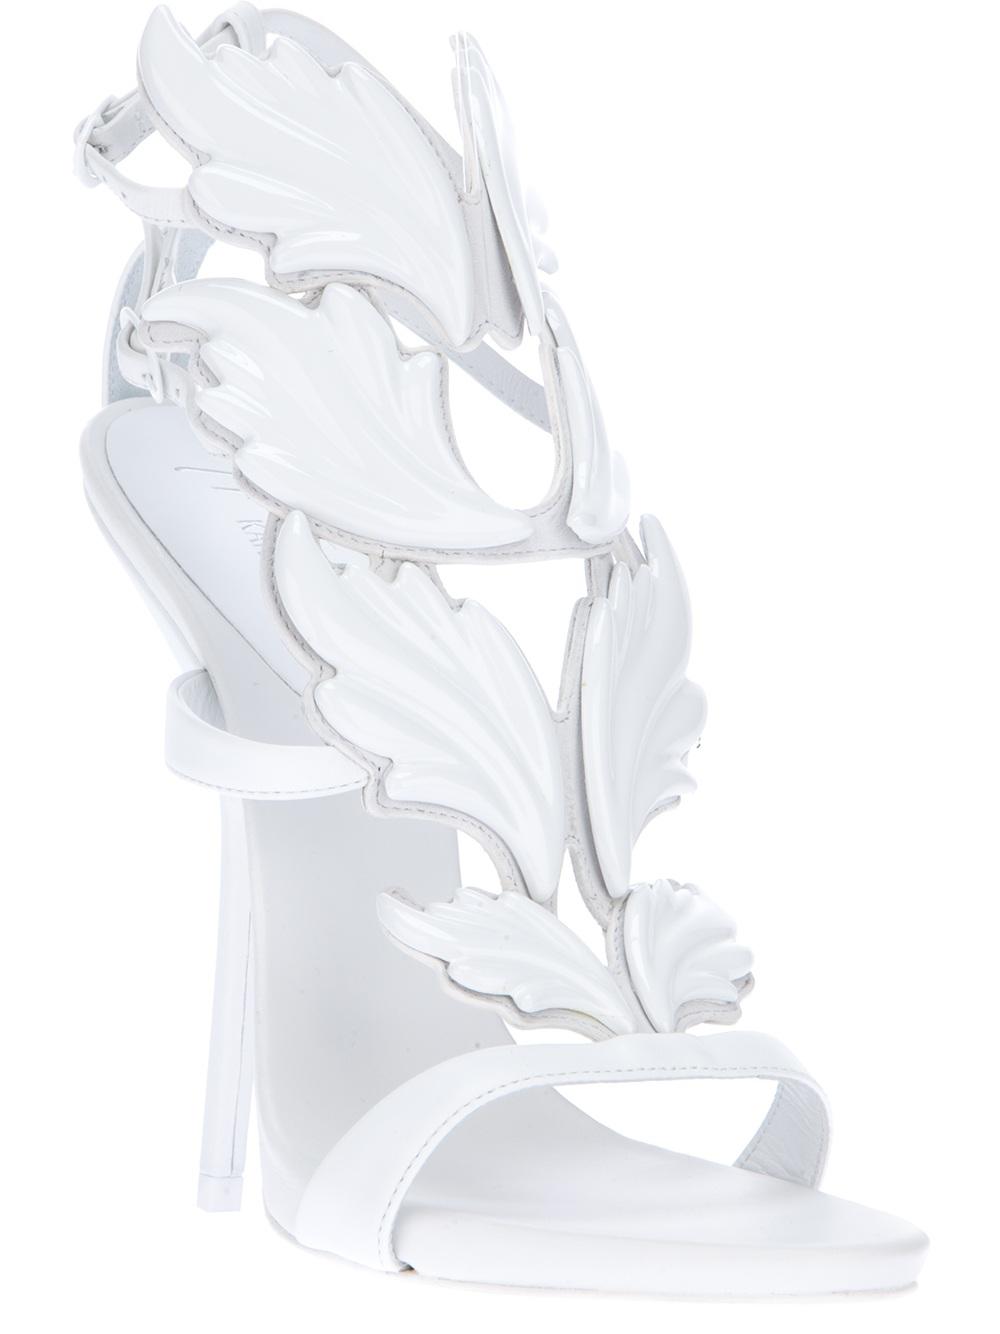 94549ebb9ced9 Giuseppe Zanotti 'Cruel Summer' Sandals in White - Lyst